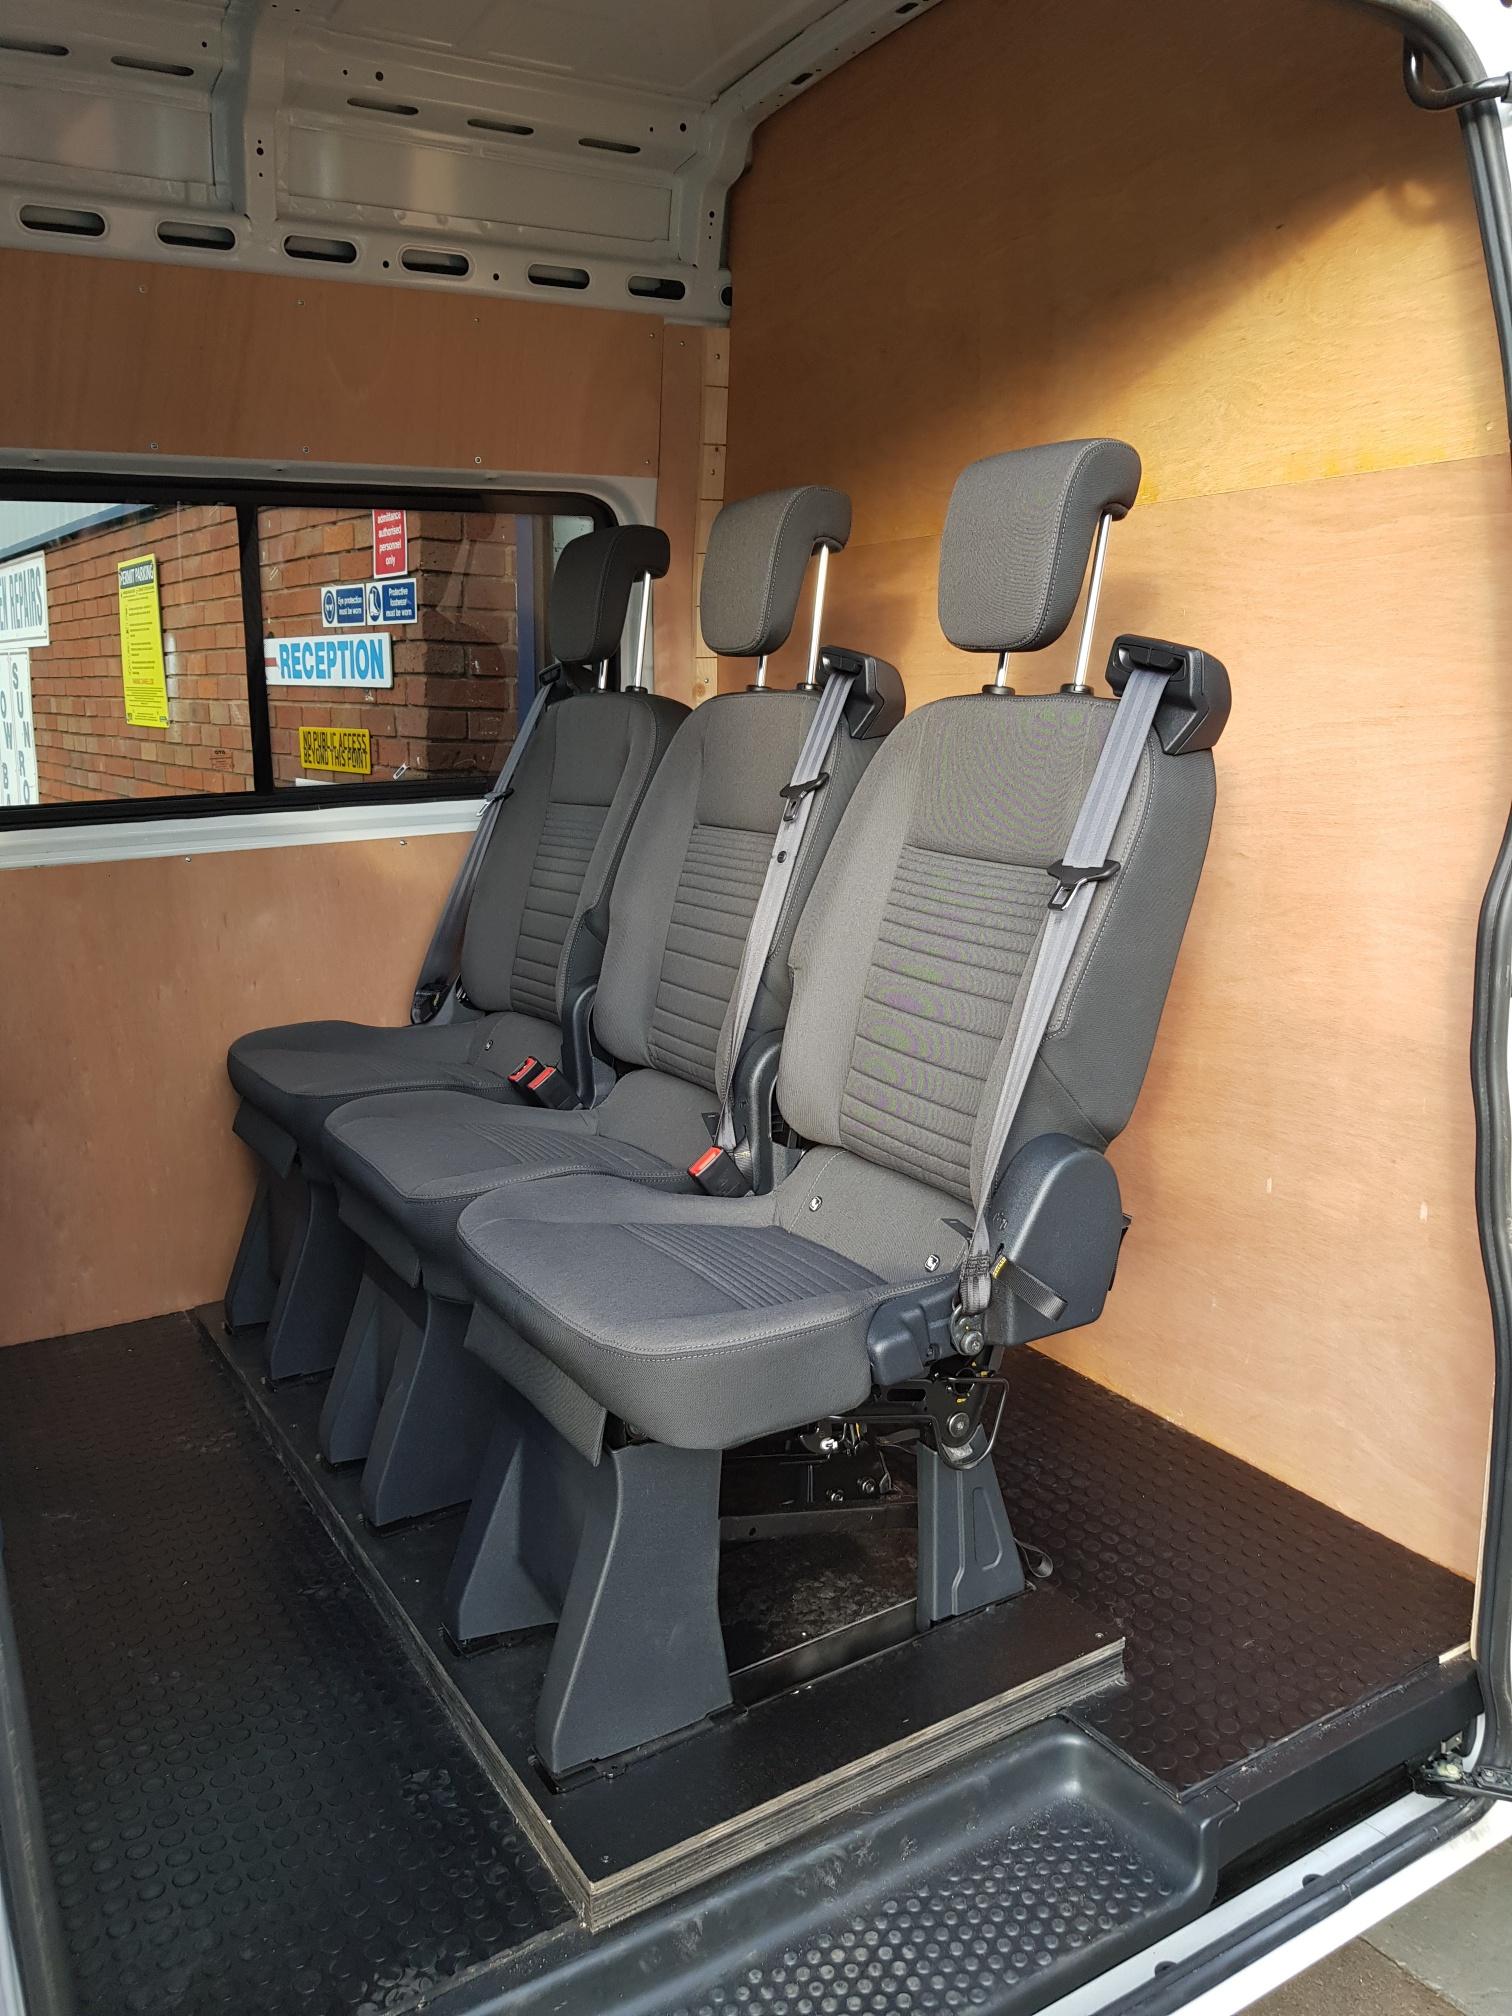 Van Seat Conversions | Seat Conversions | Fastfit |Midlands